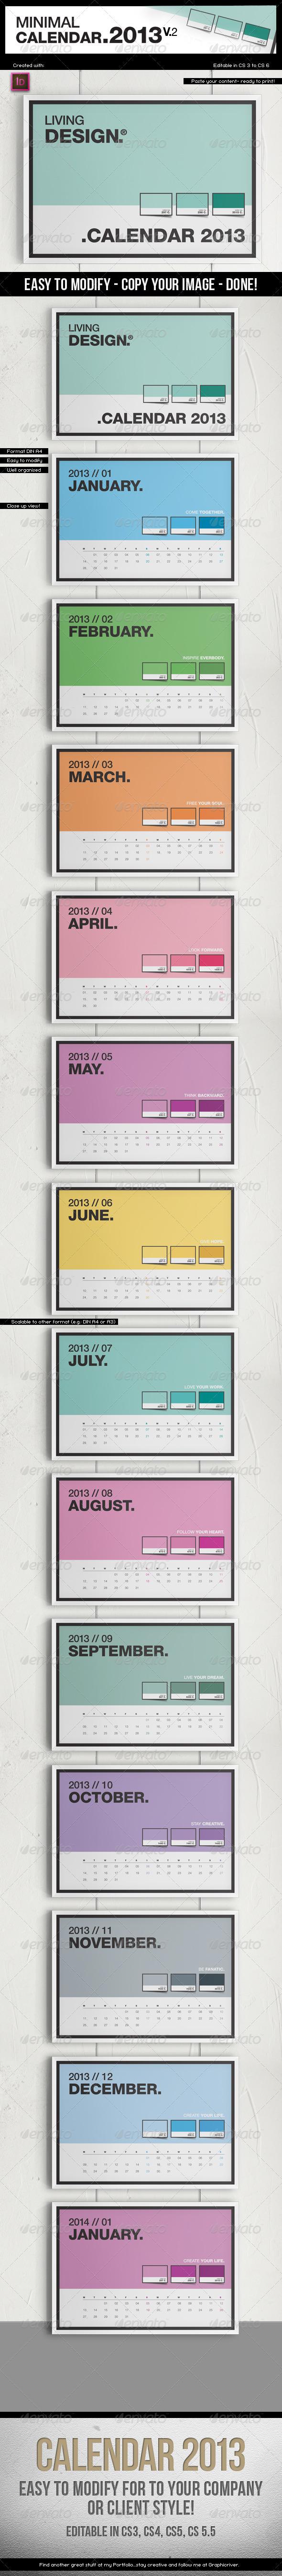 Calendar 2013 v2 // A4 Template // Pantone ® Style - Calendars Stationery